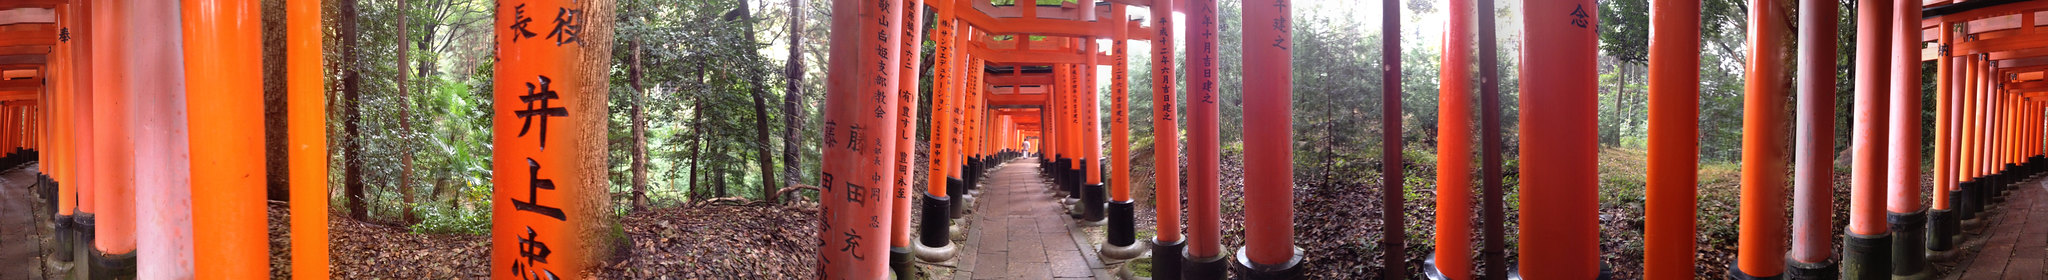 Fushimi Inari shrine panorama